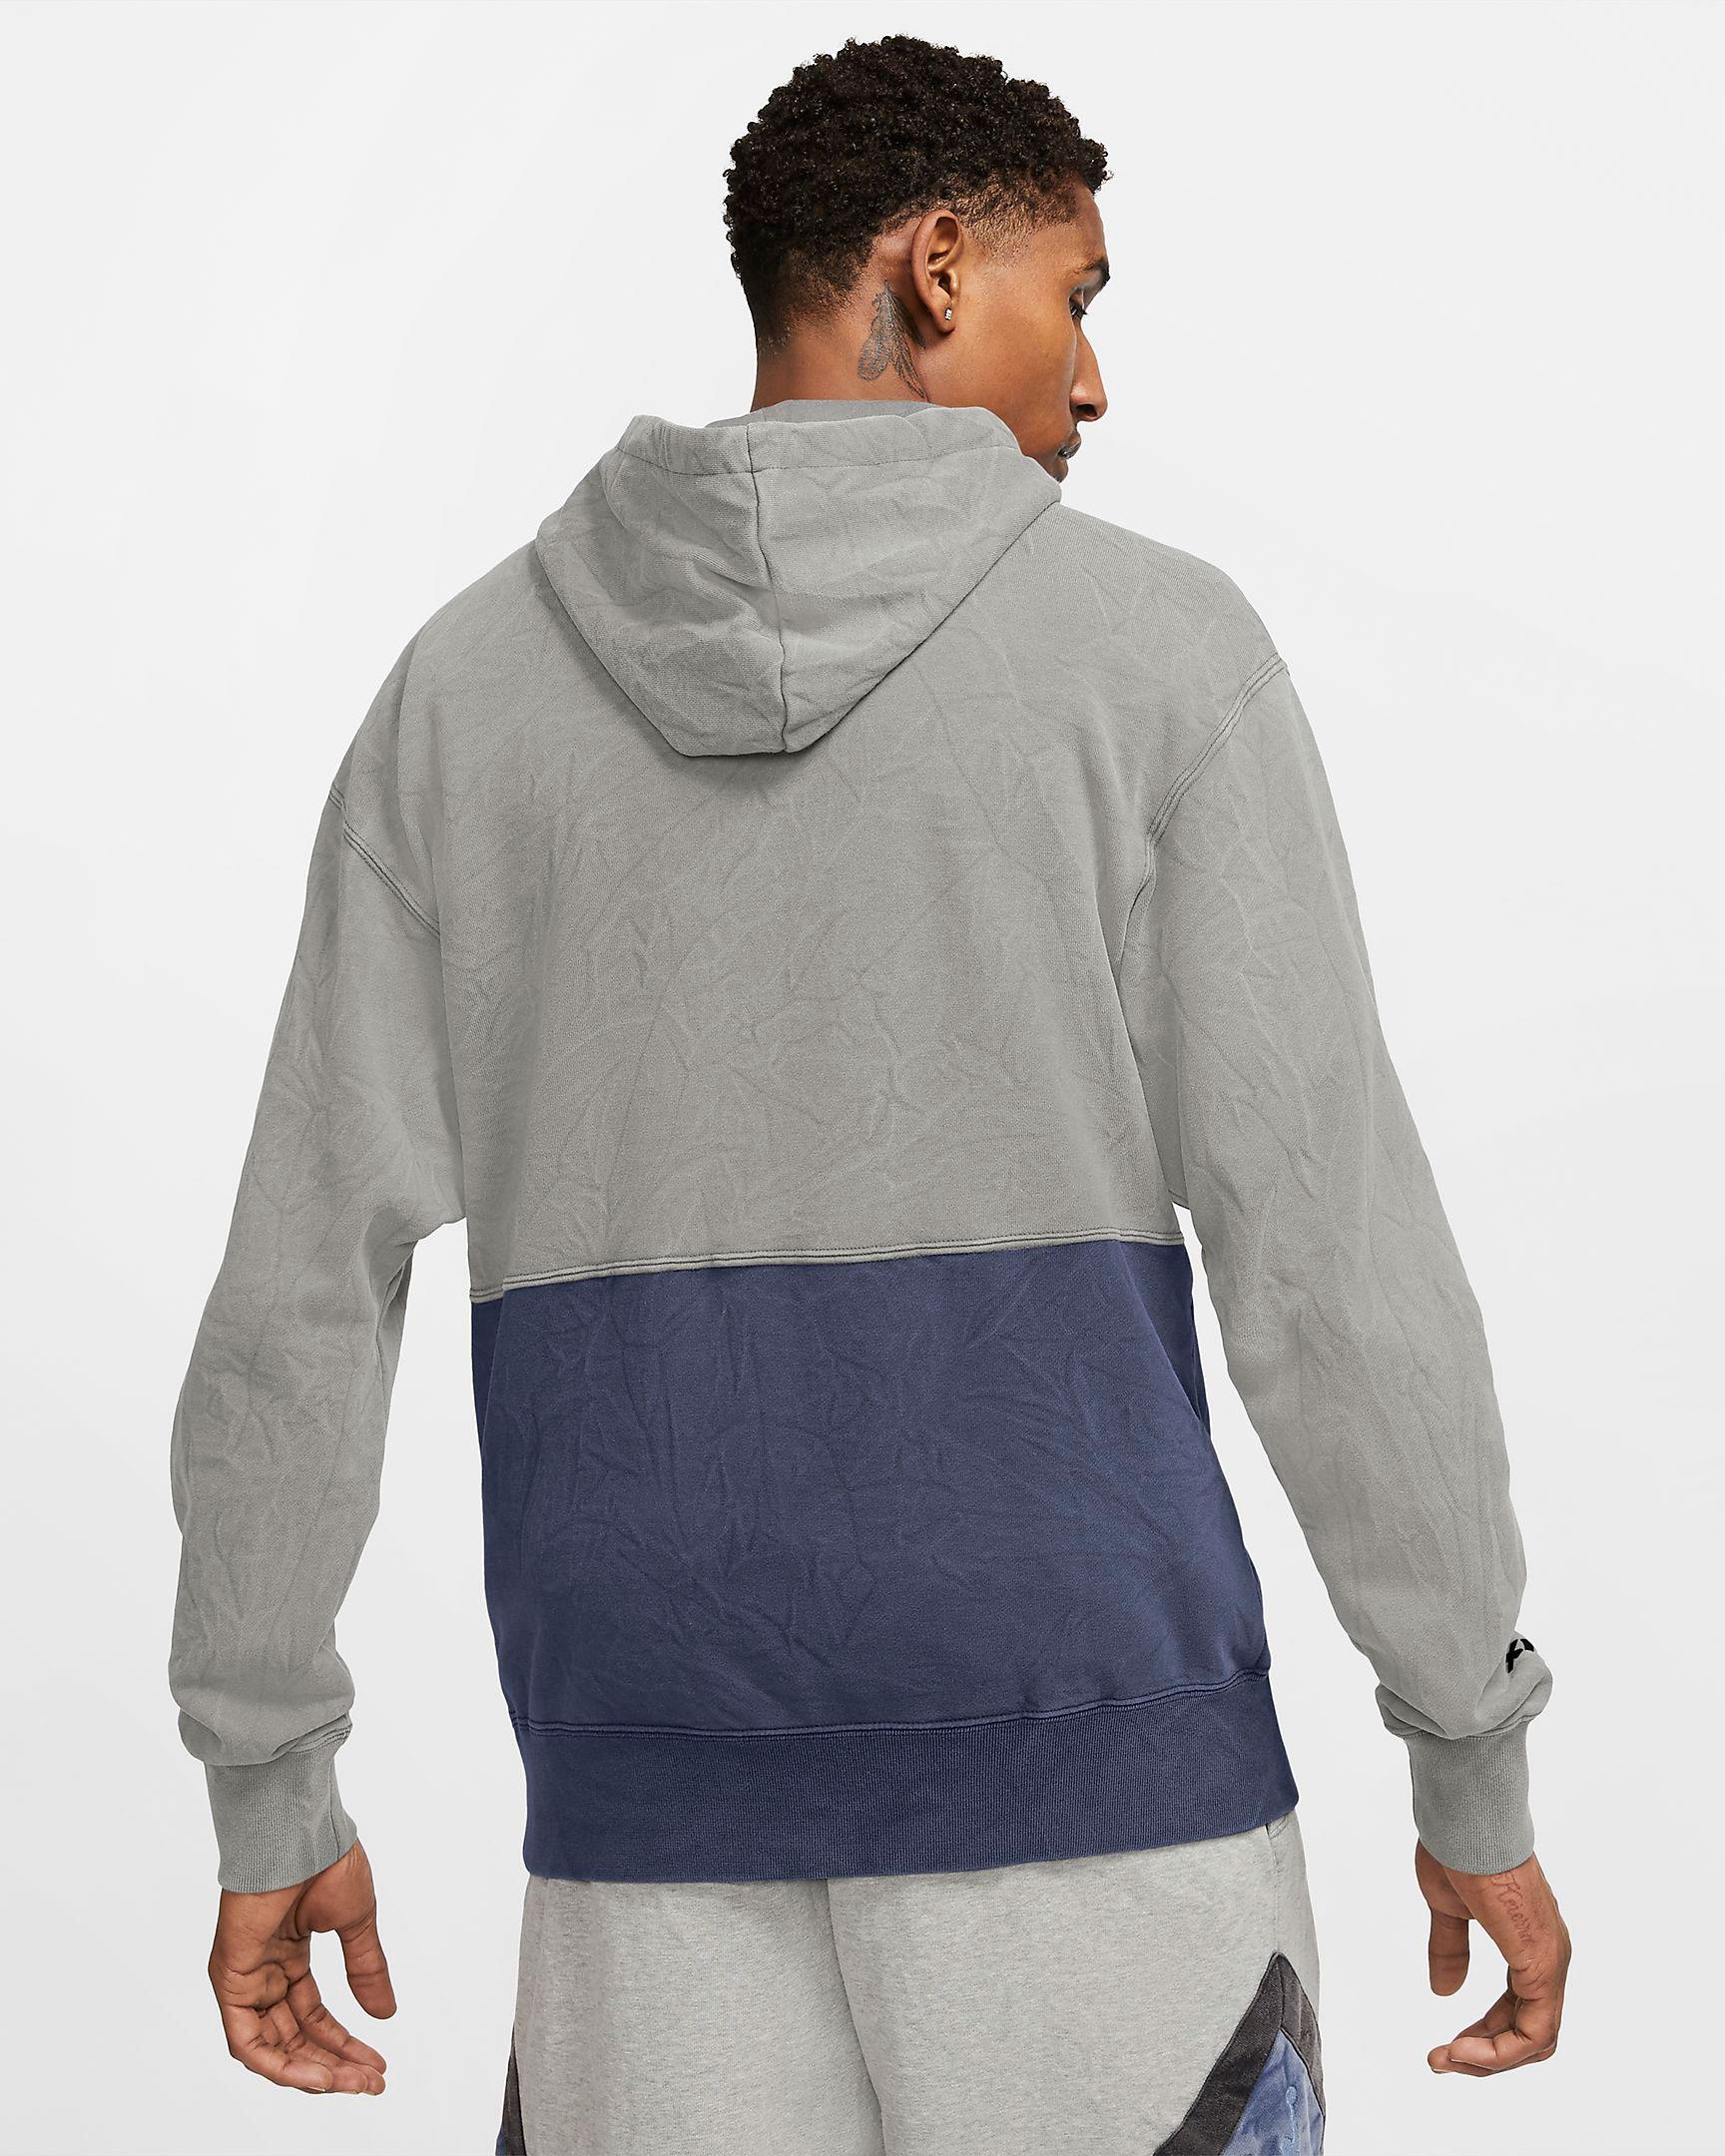 jordan-1-midnight-navy-hoodie-match-2